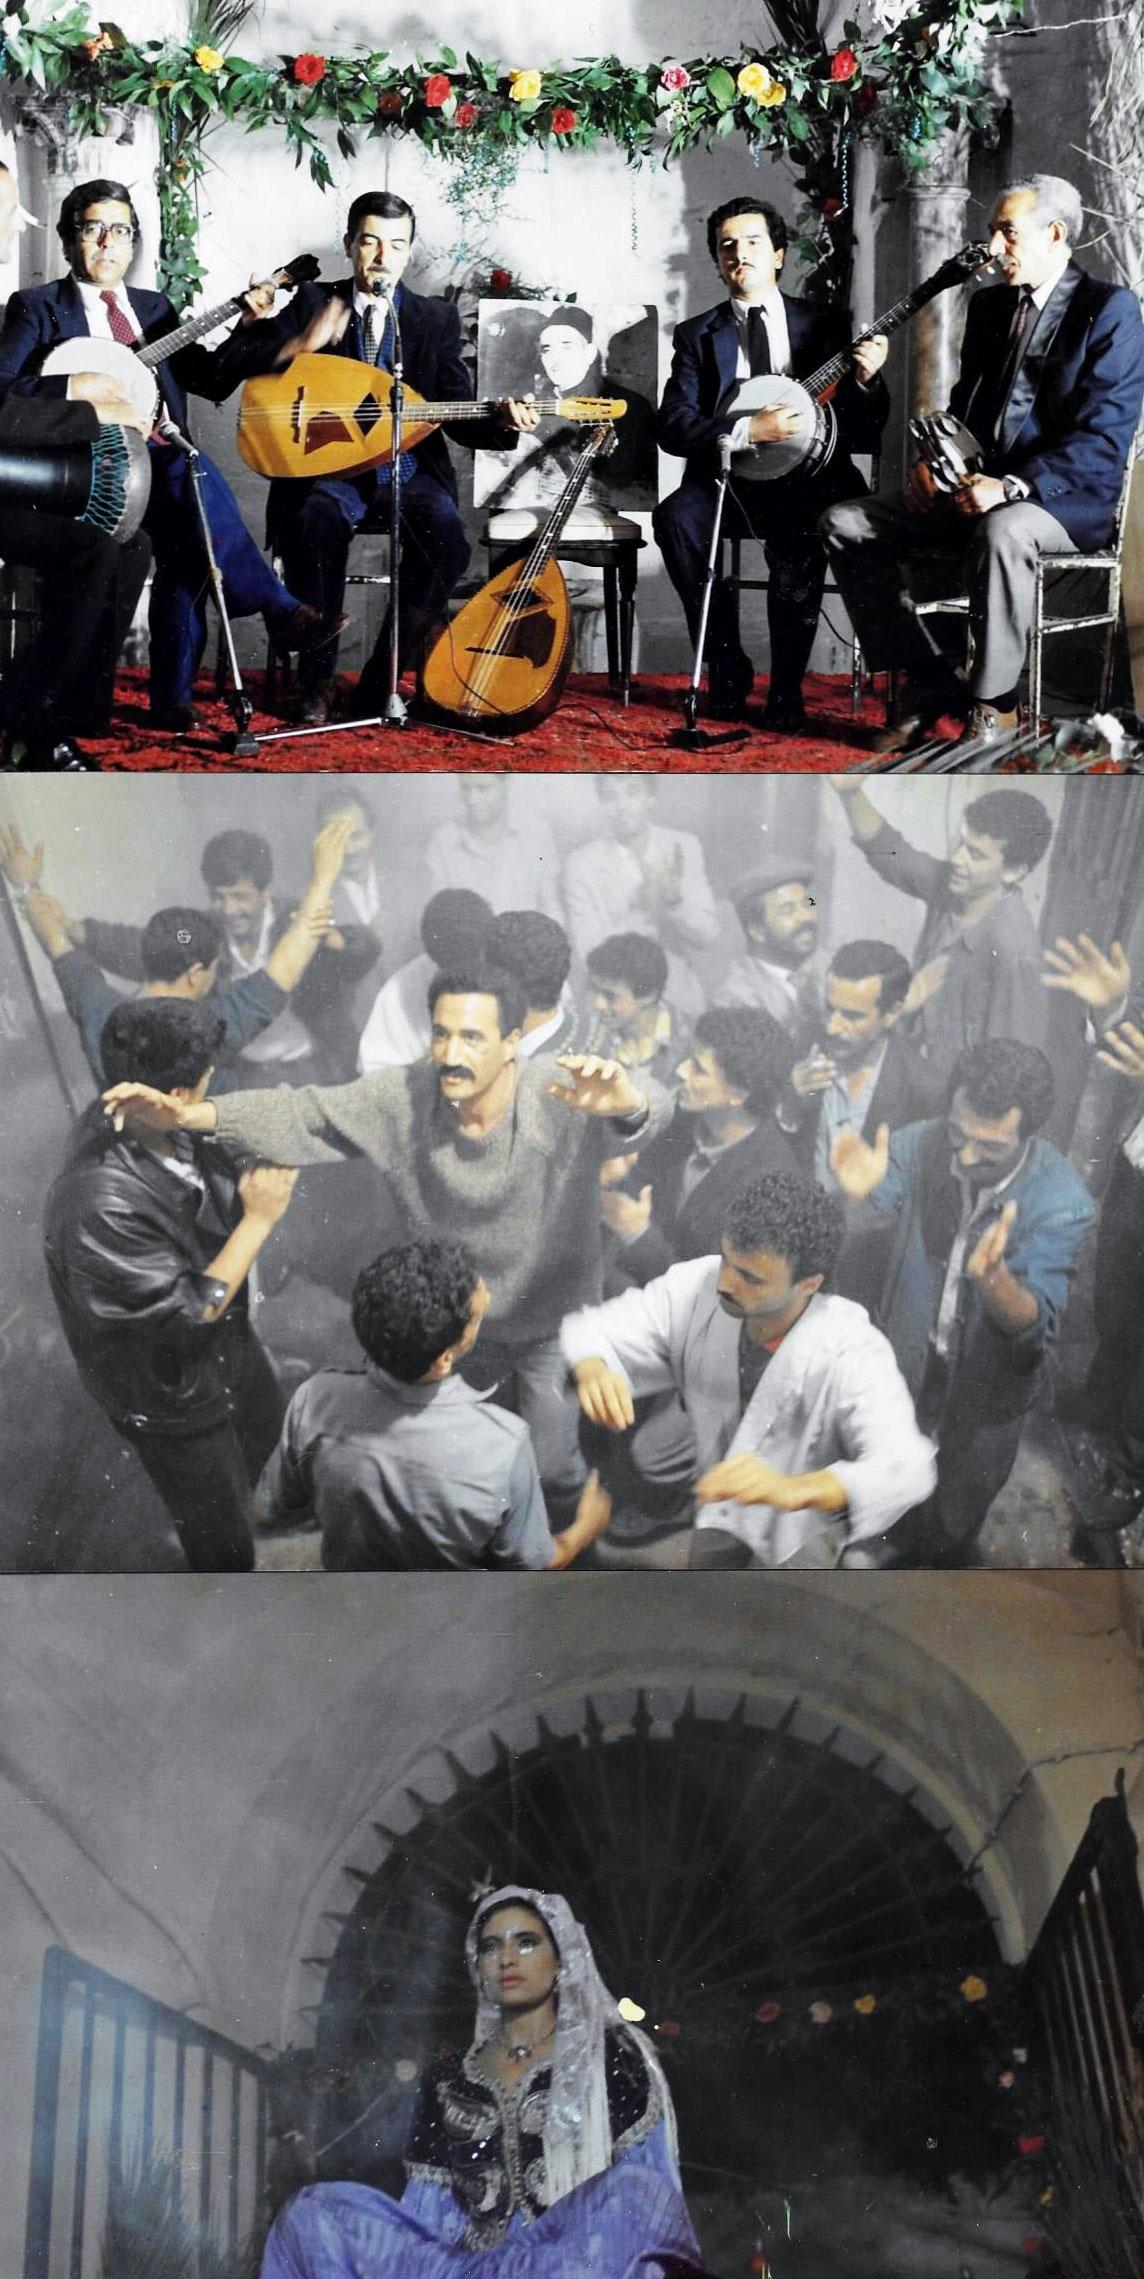 Café-MALAKOF.--Orchestre-chaabi.-Aziz-danse-avec-son-Andalouse...-Mohamed-Fellag----1988-LUMIERES